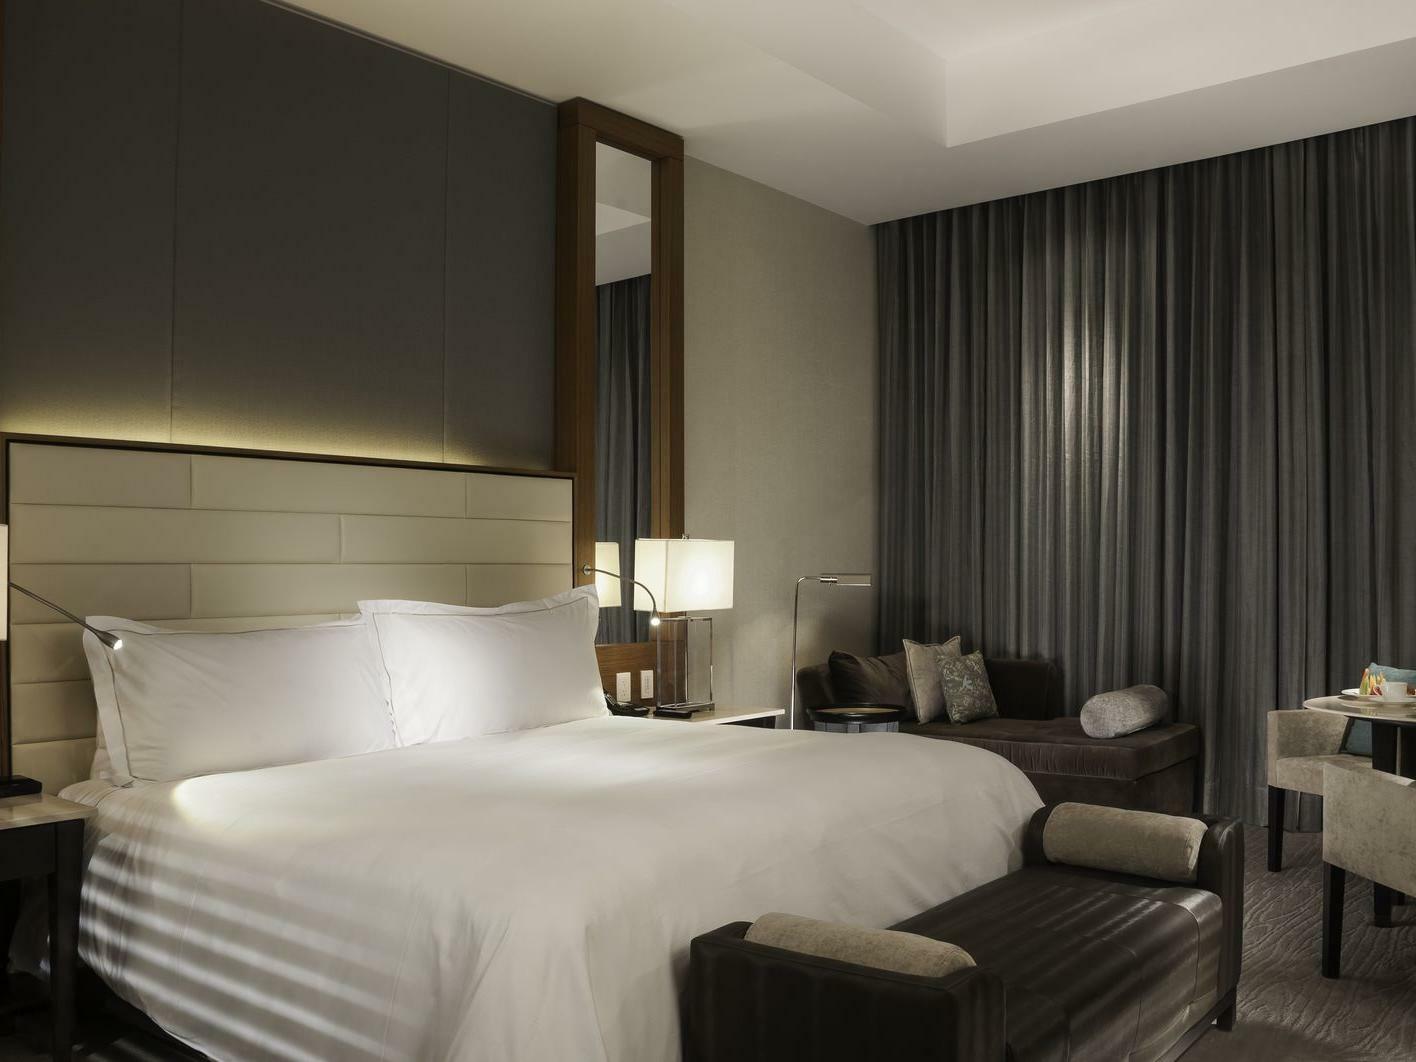 Deluxe room 1 king bed at Live Aqua Urban Resort Mexico